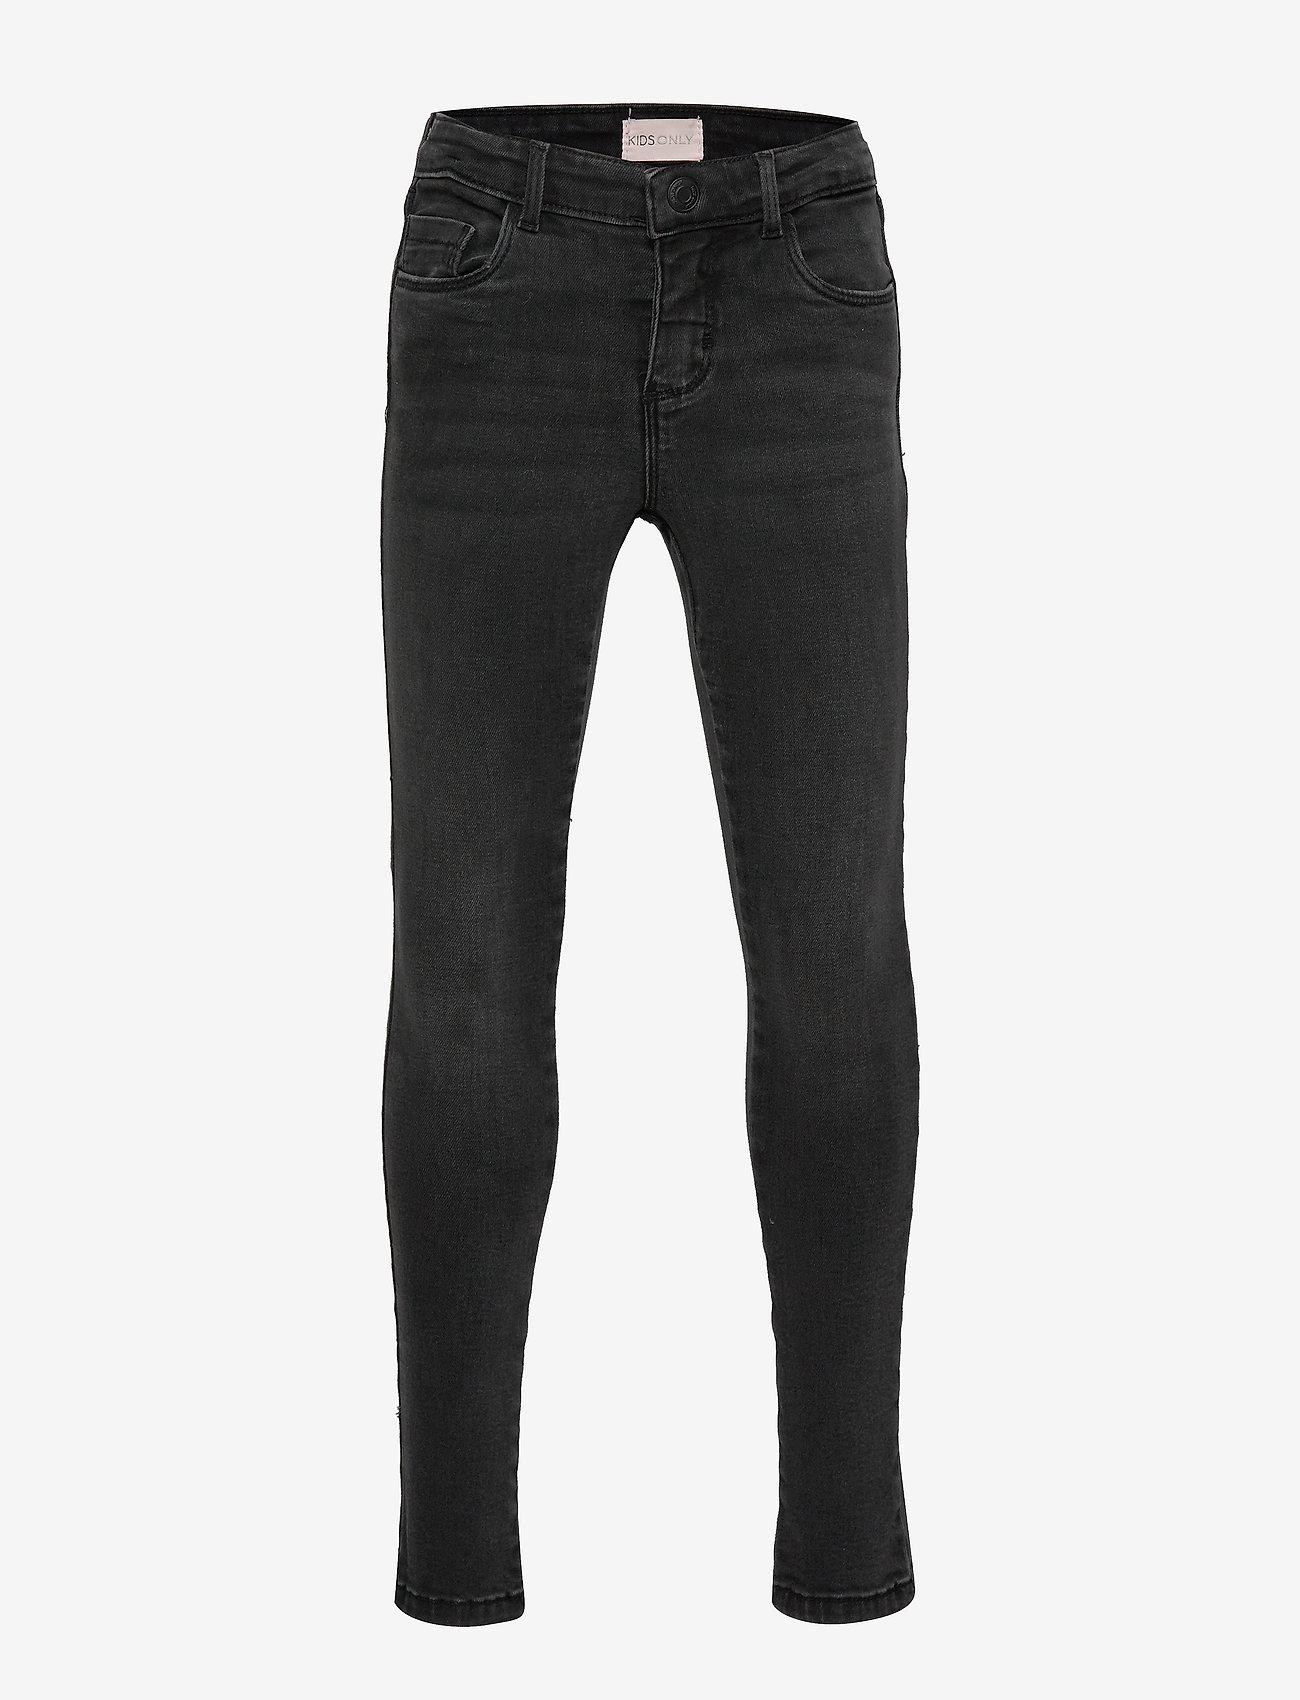 Kids Only - KONRACHEL BLACK DNM JEANS NOOS - jeans - black denim - 0